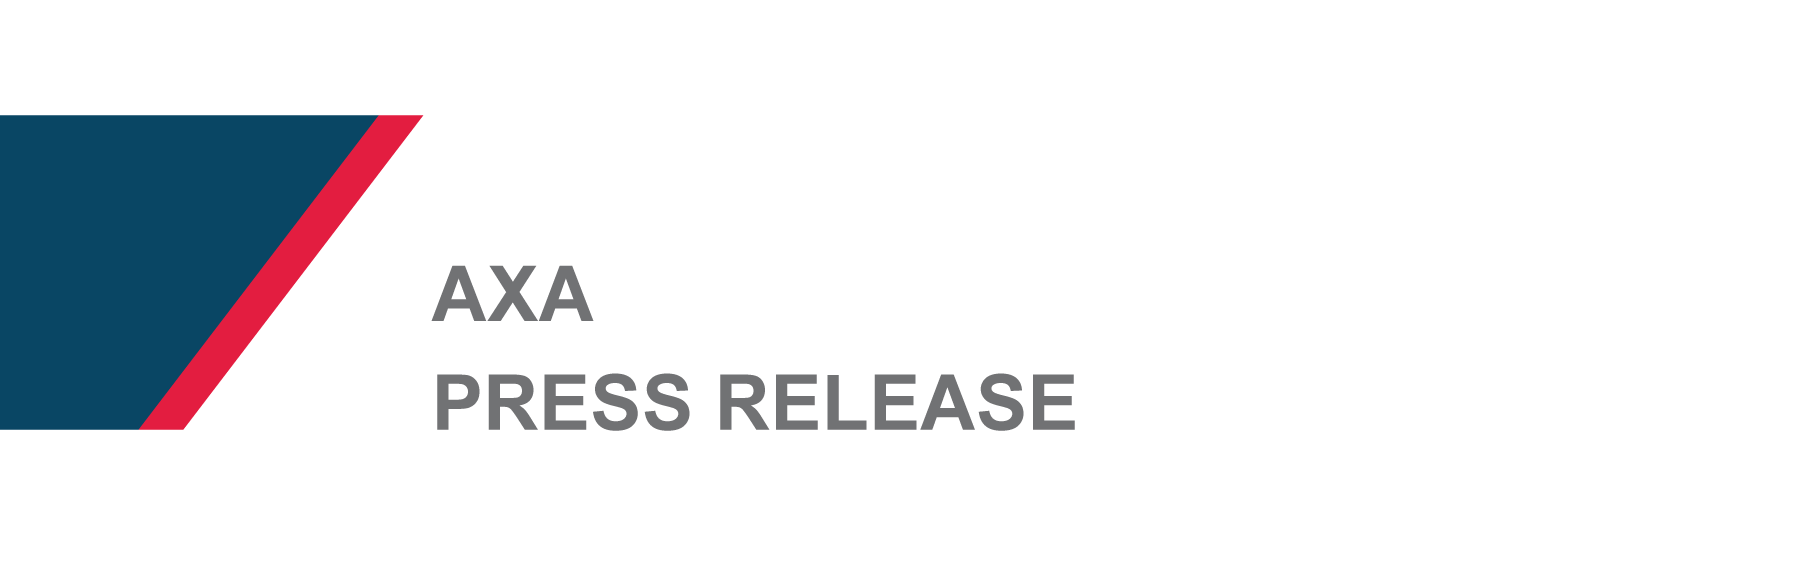 AXA Press Release